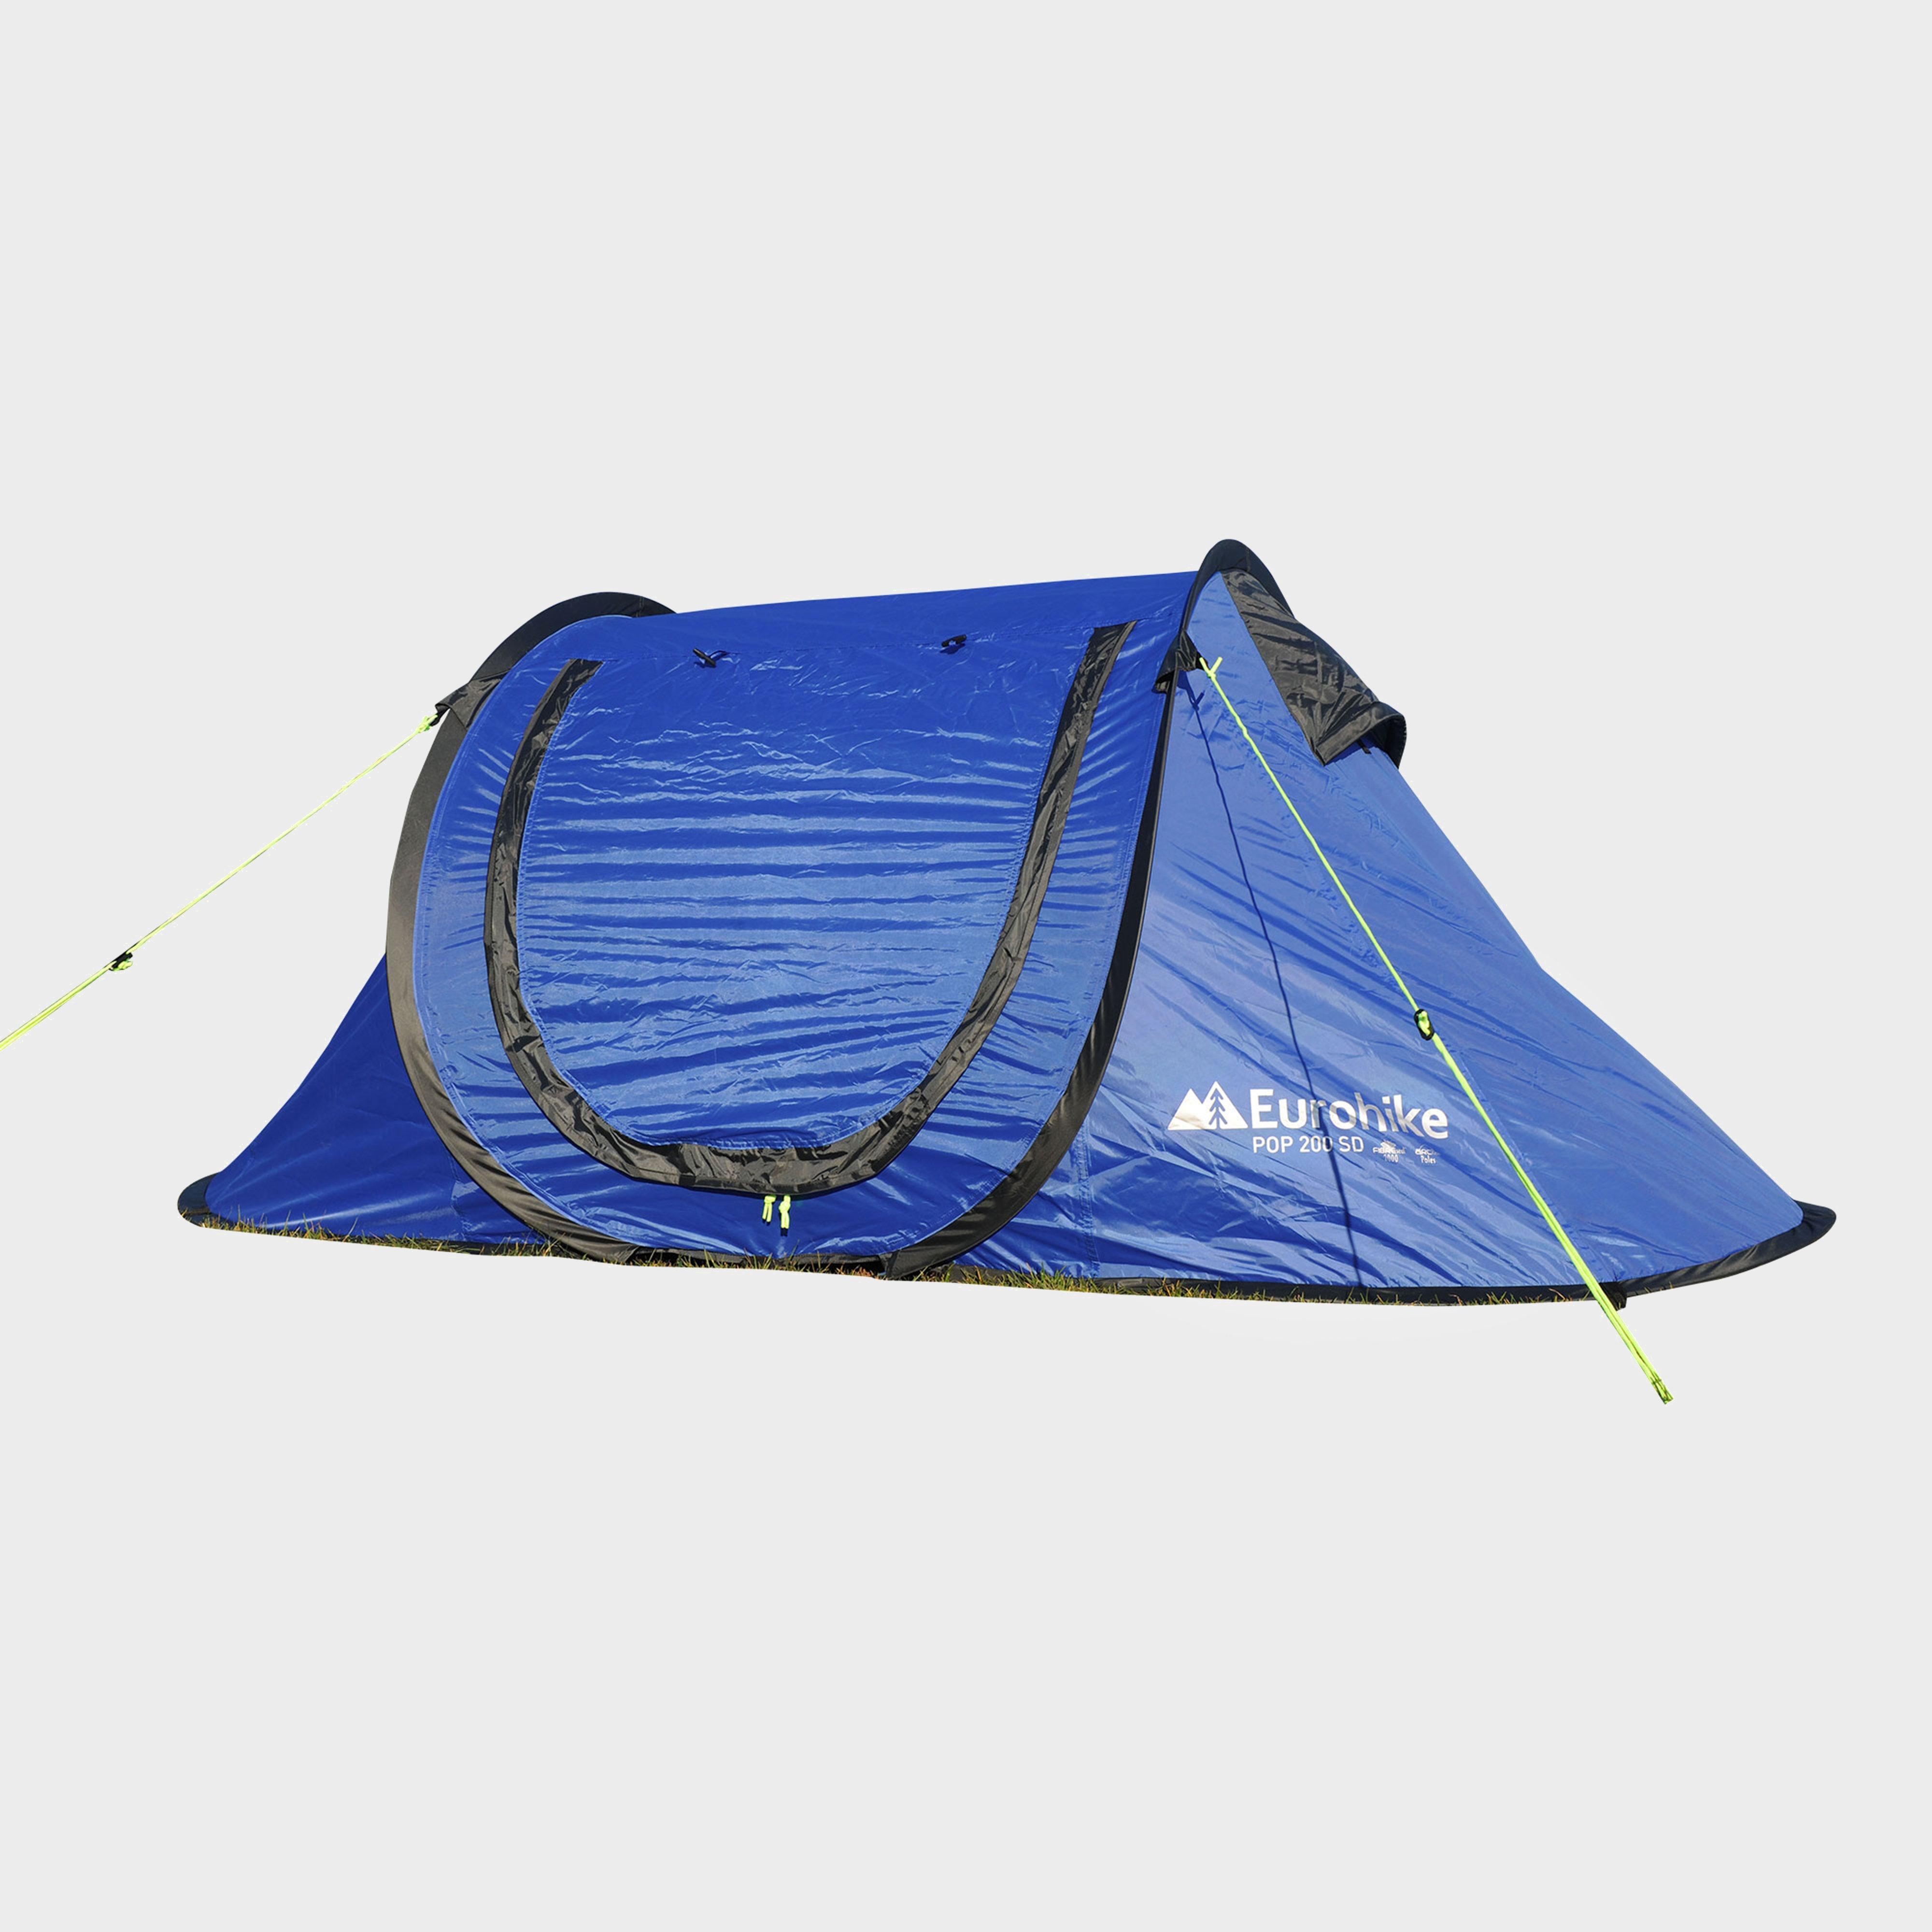 Eurohike 2 Man Tent Amp Eurohike Pop 200 2 Person Tent